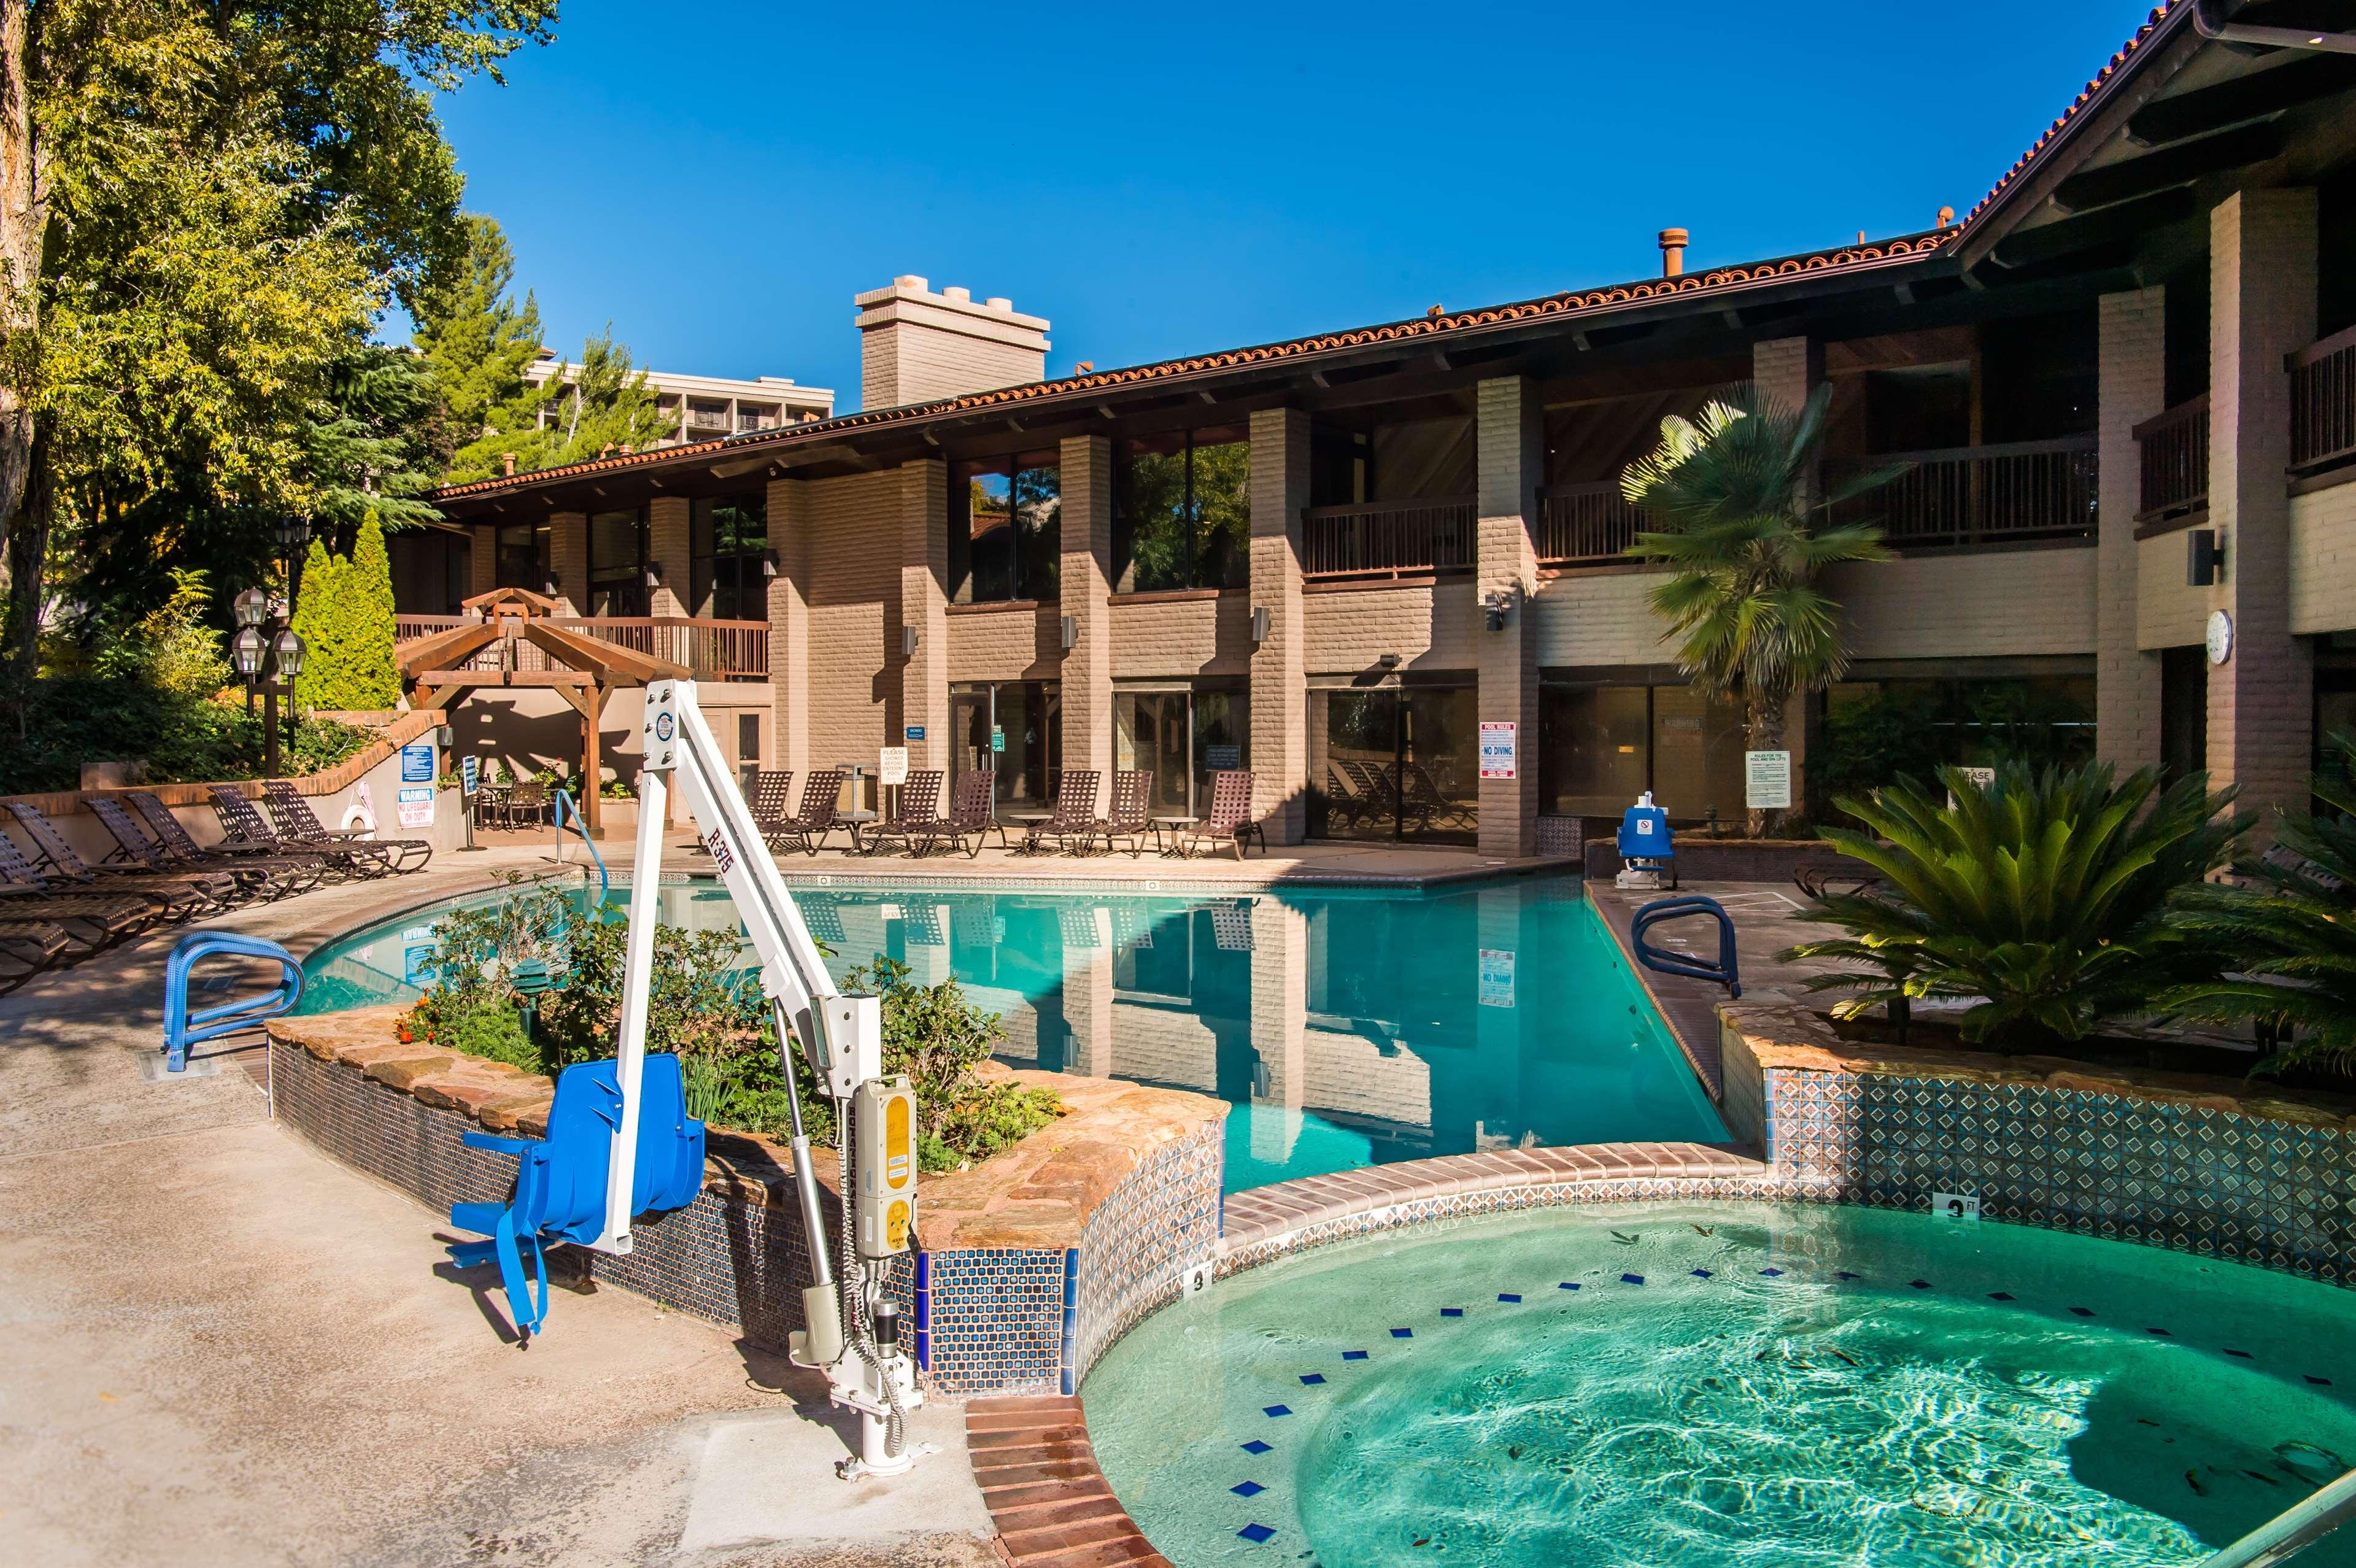 Best Western Plus Arroyo Roble Hotel & Creekside Villas image 15